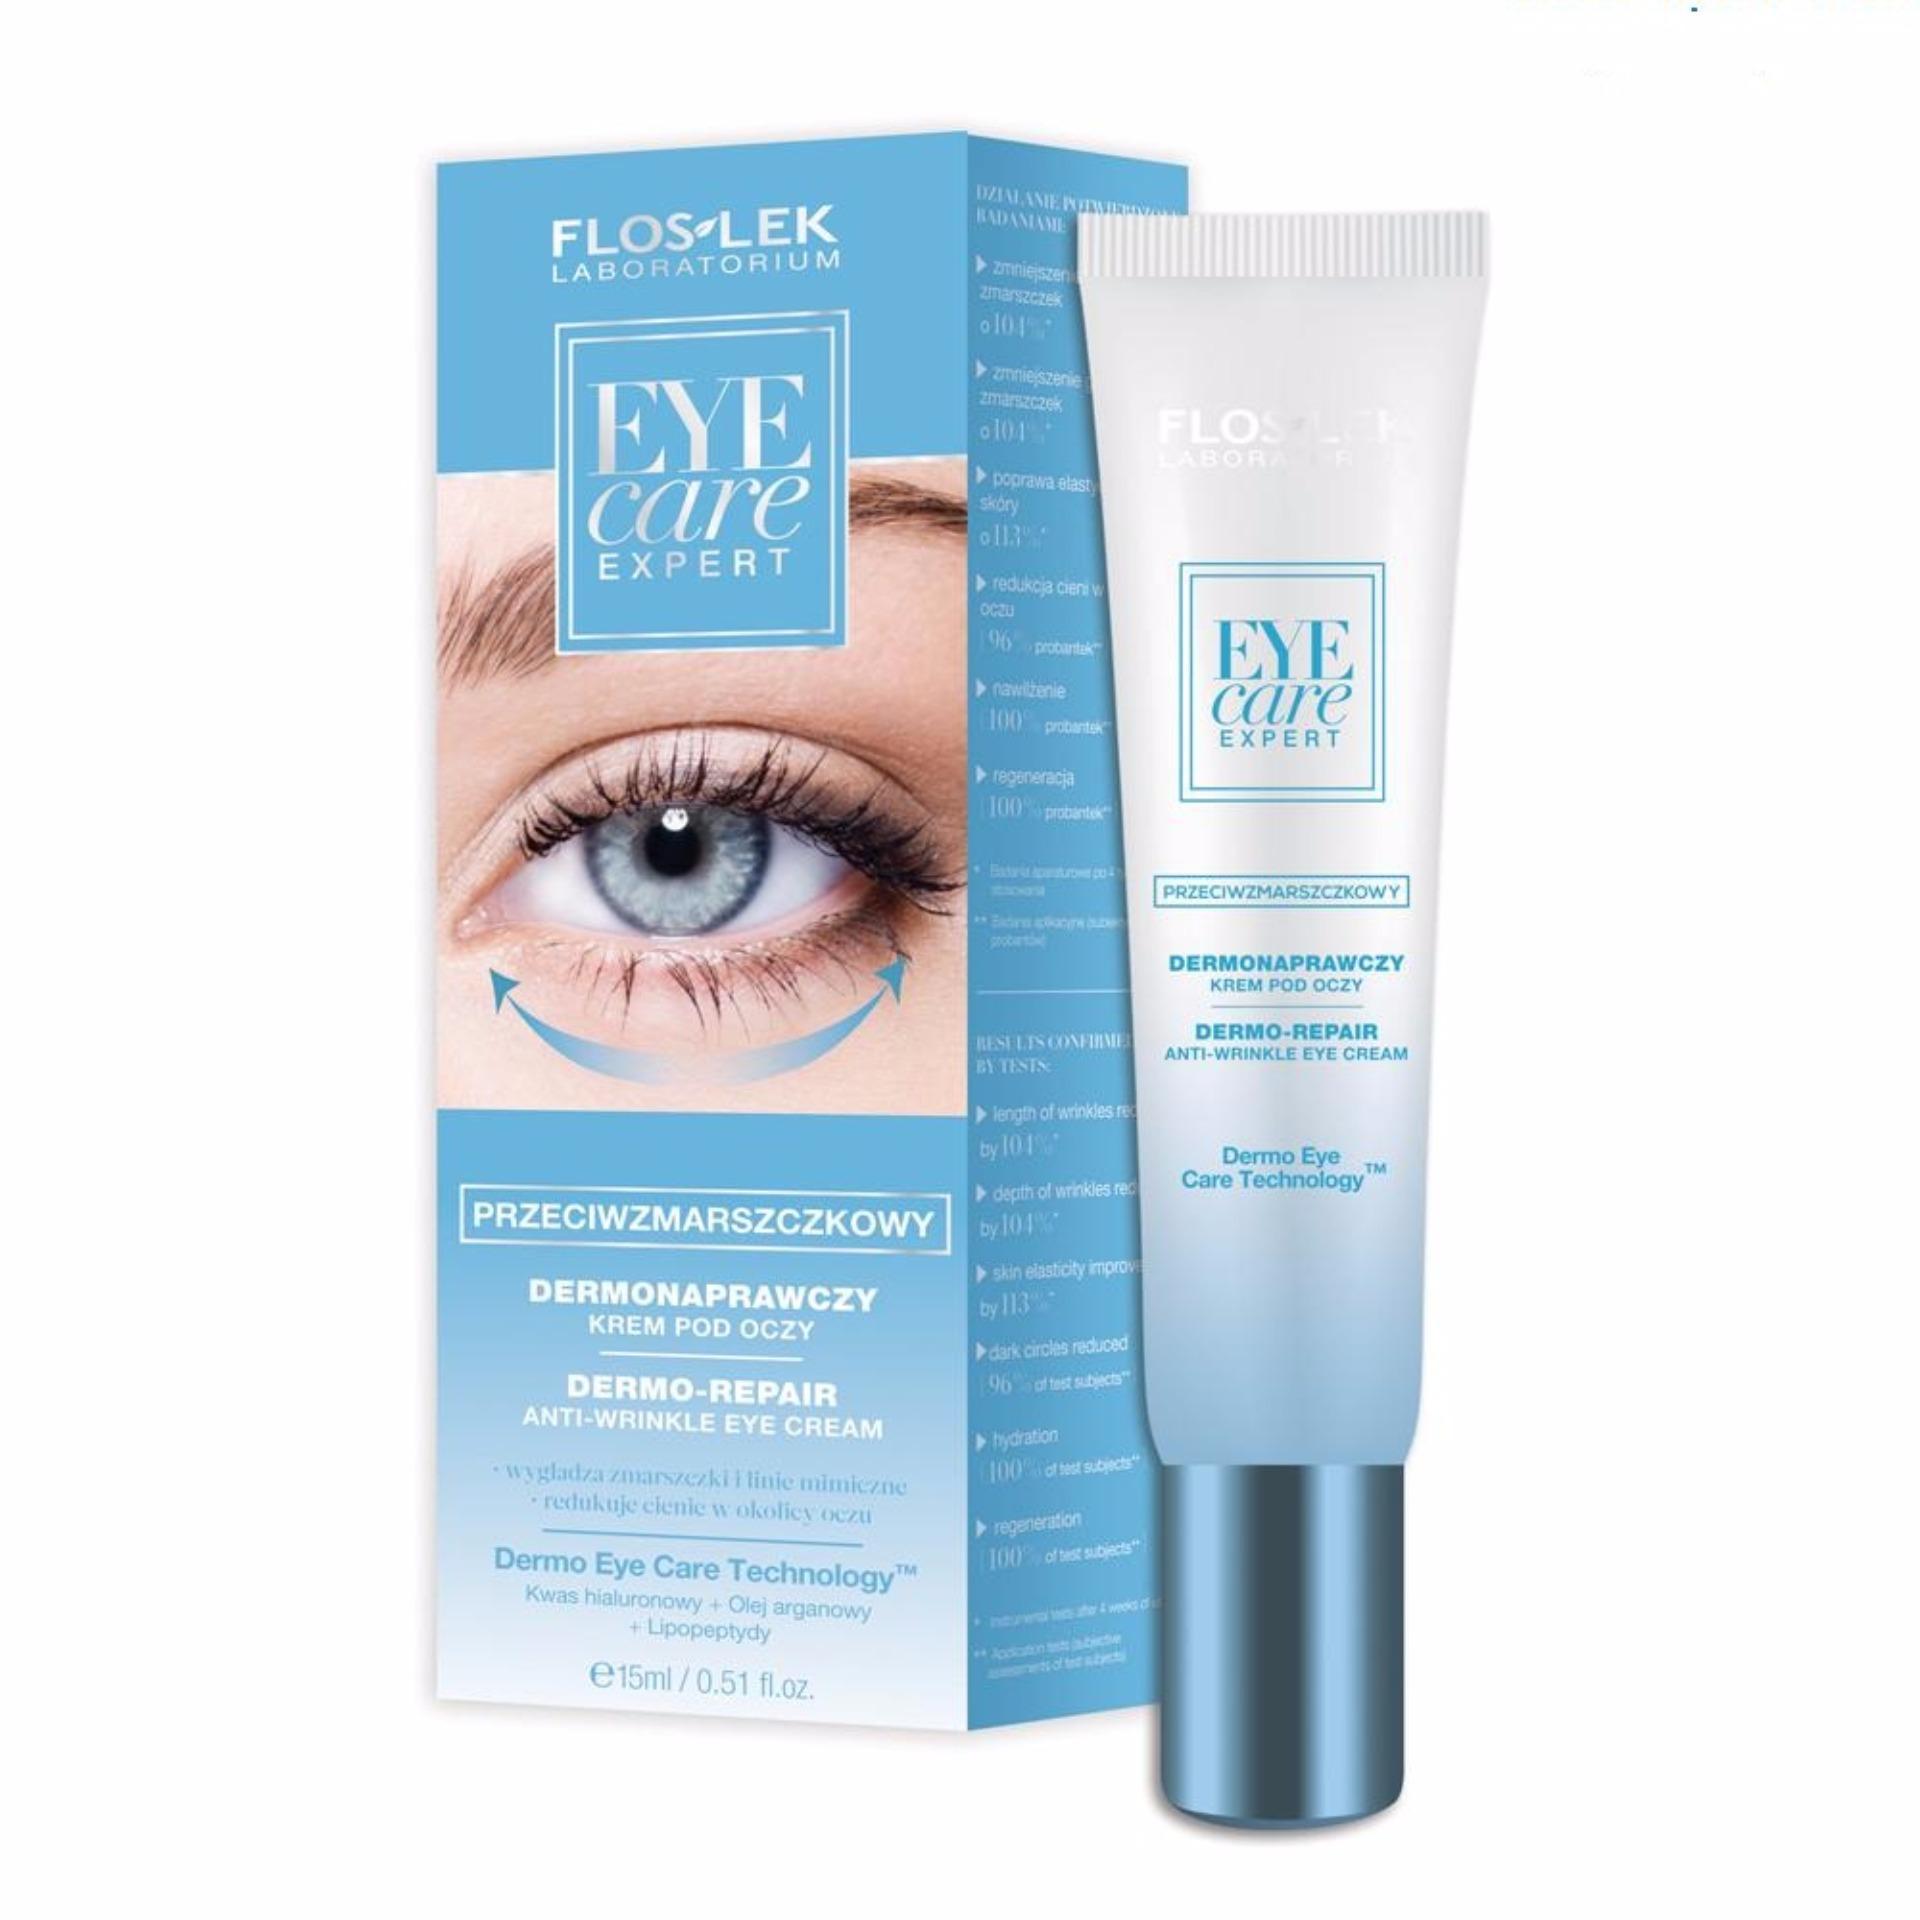 Kem trẻ hóa và chống nhăn da vùng mắt – Eye Care Expert Dermo repair anti wrinkle eye cream 15ml